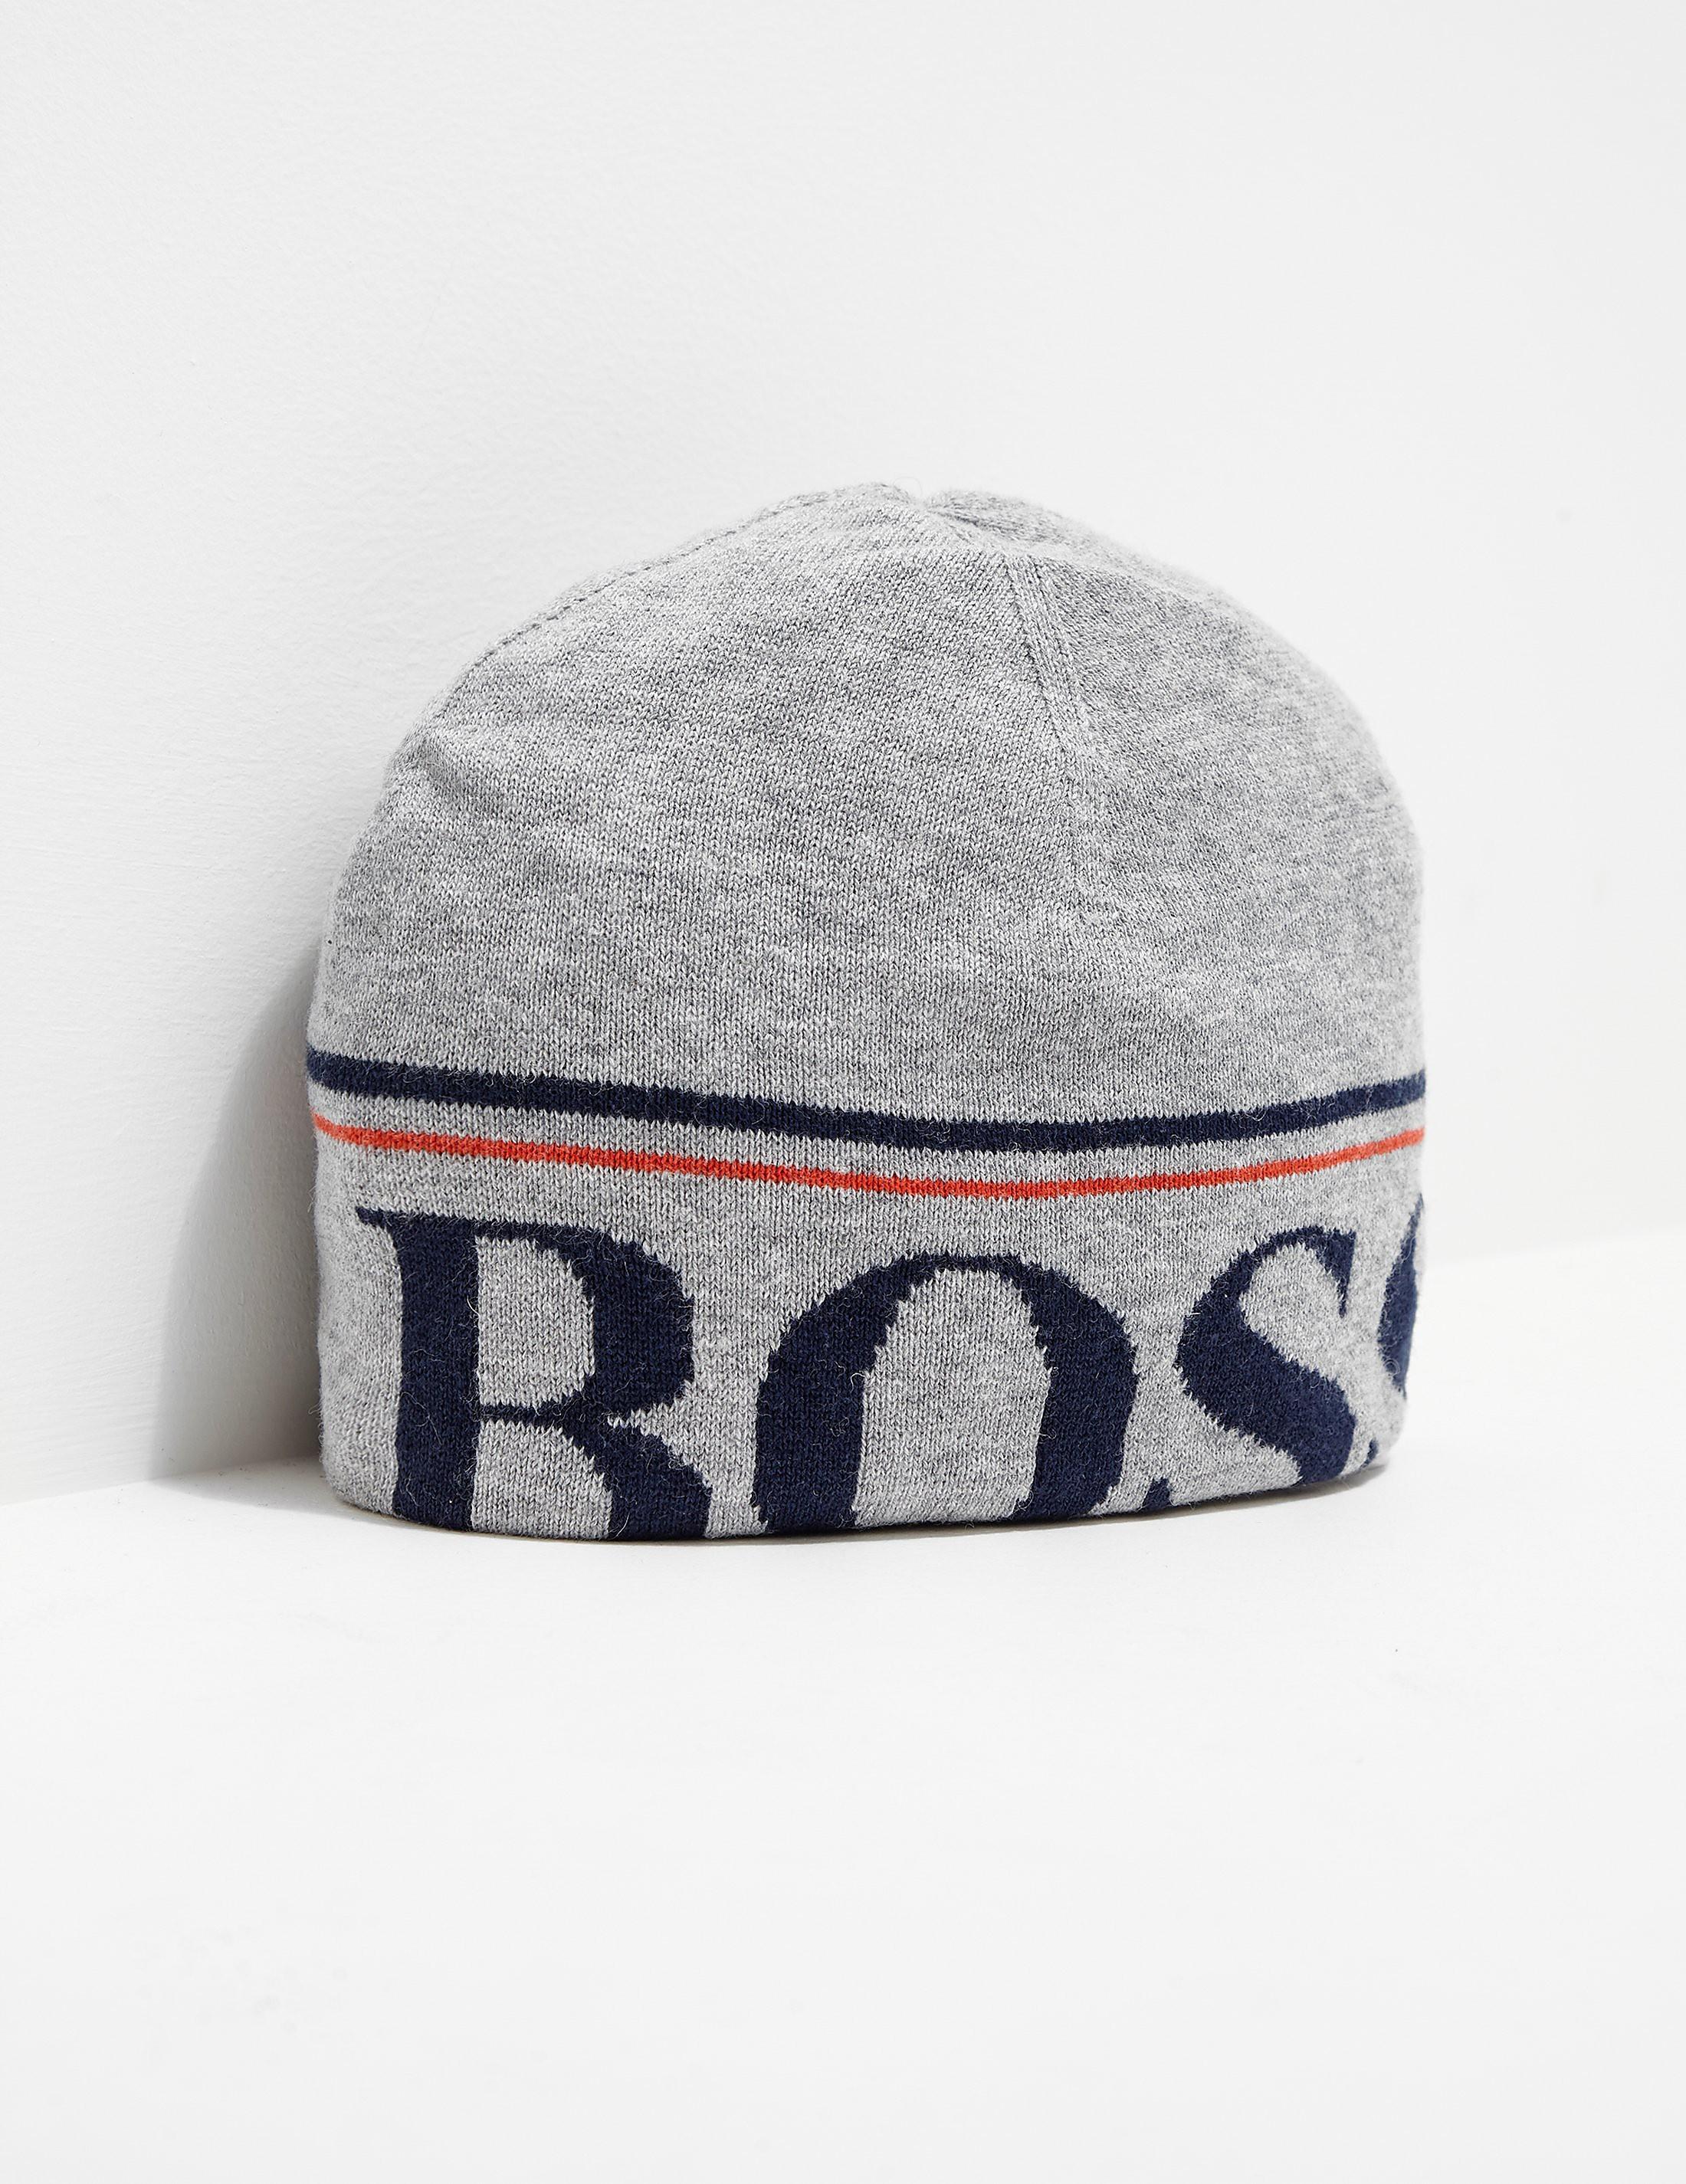 BOSS Kids' Logo Beanie Hat